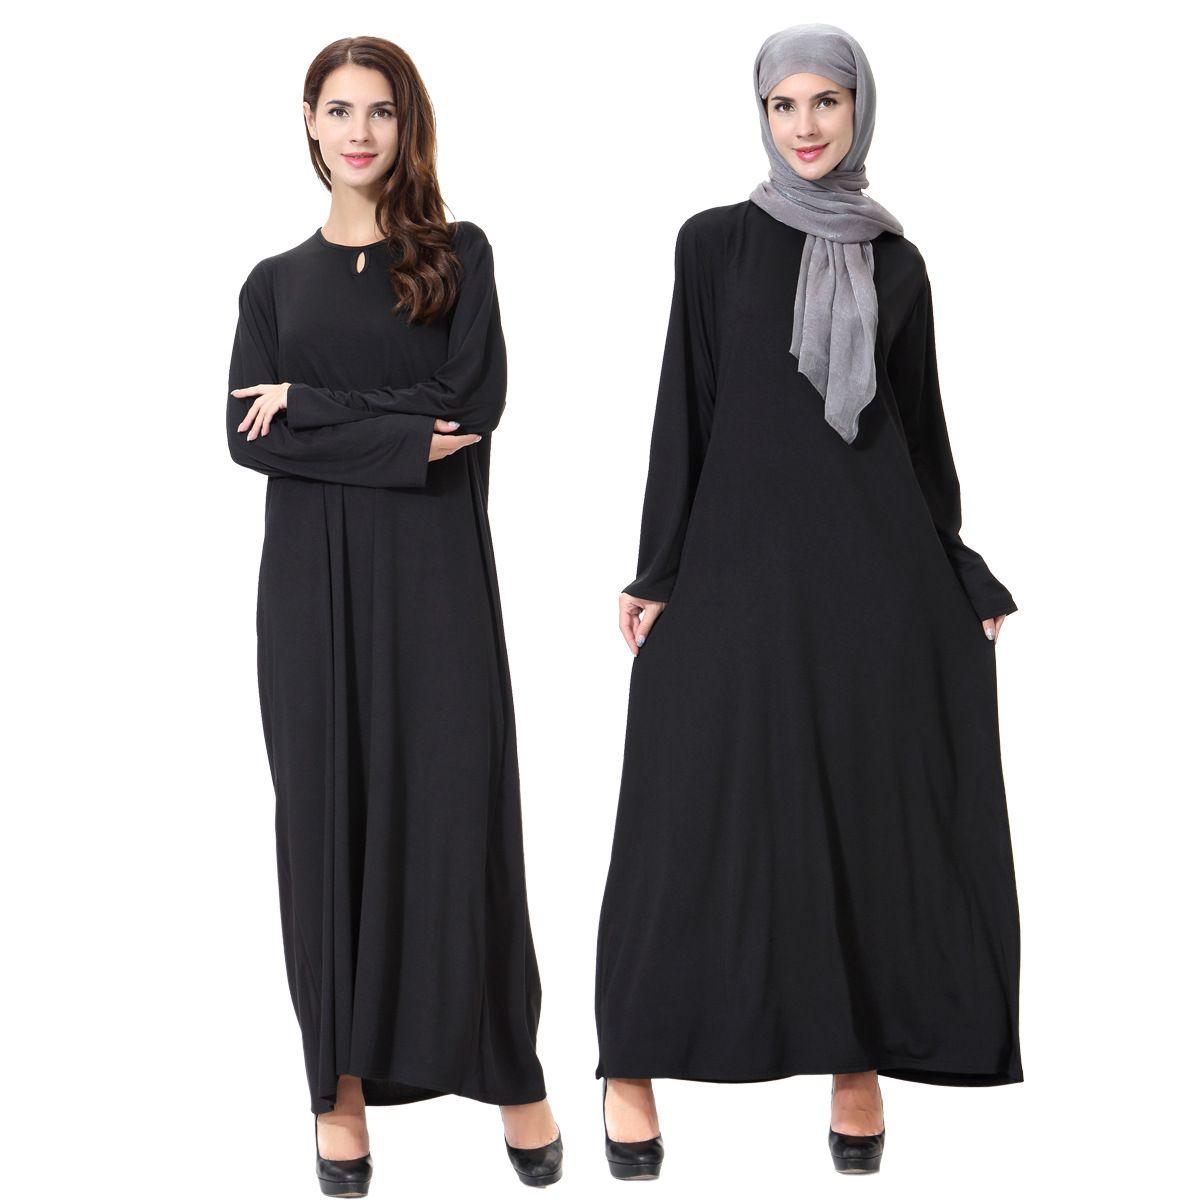 f3ba9a8e298a New Arrival Islamic Black Cloak Abayas Muslim Long Dress For Women Malaysia  Dubai Turkish Ladies Clothing High Quality Robe Tight White Dresses For  Juniors ...